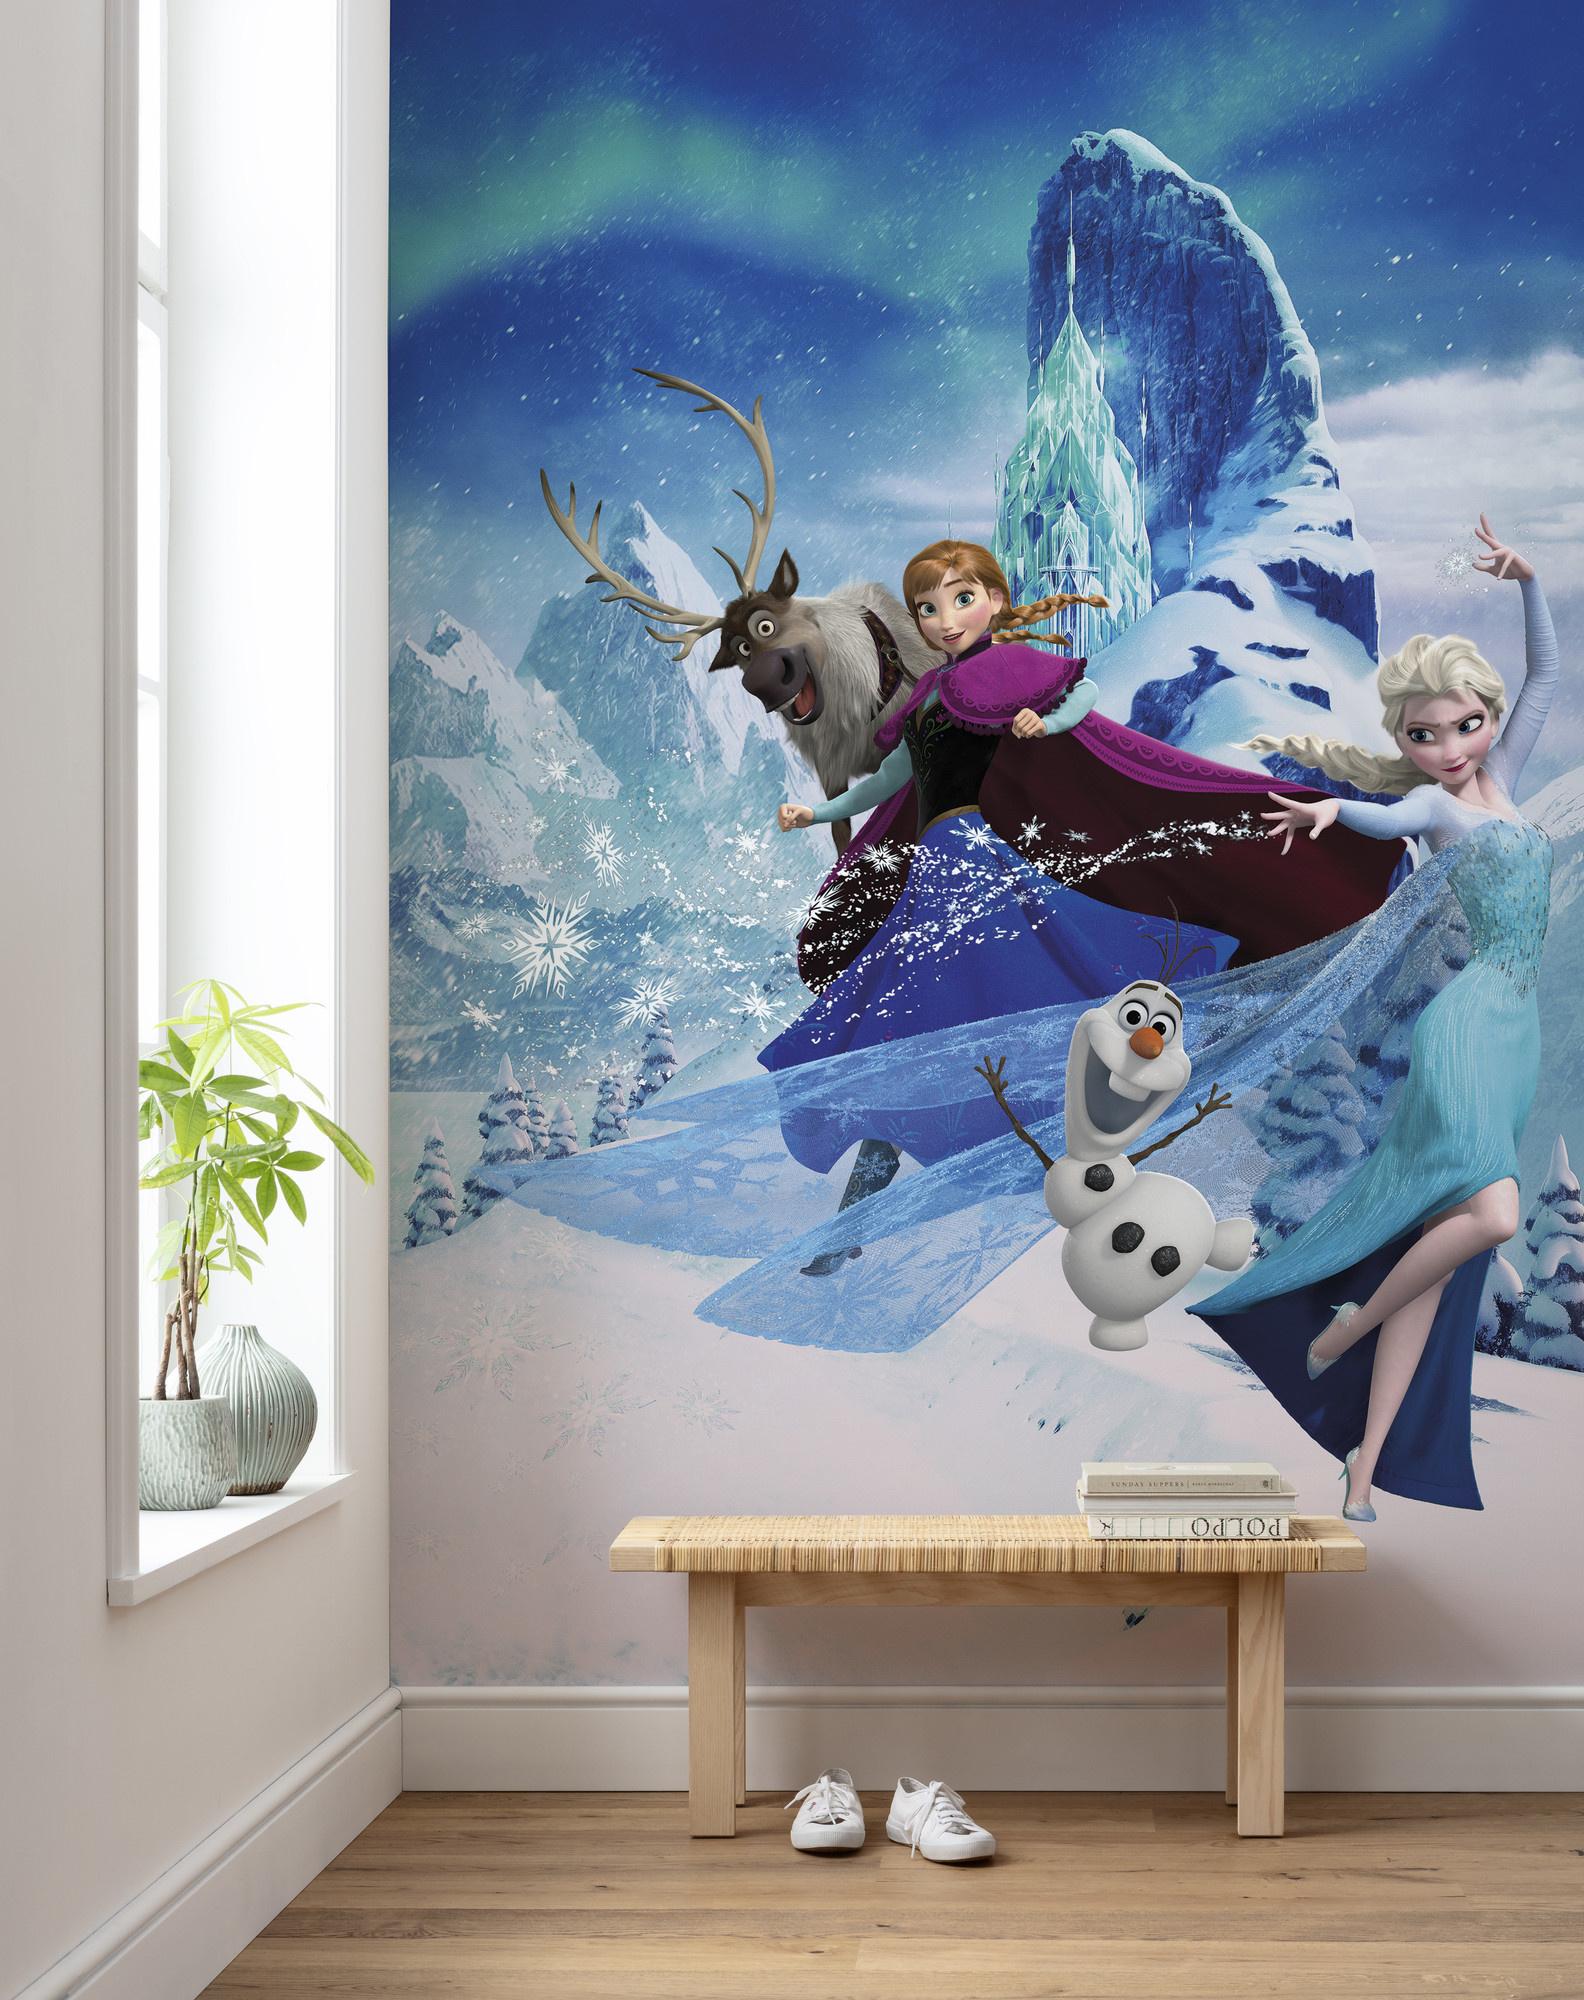 Disney Edition 4 Kinderbehang Komar - Kinderkamer behang Frozen Elsas Magic